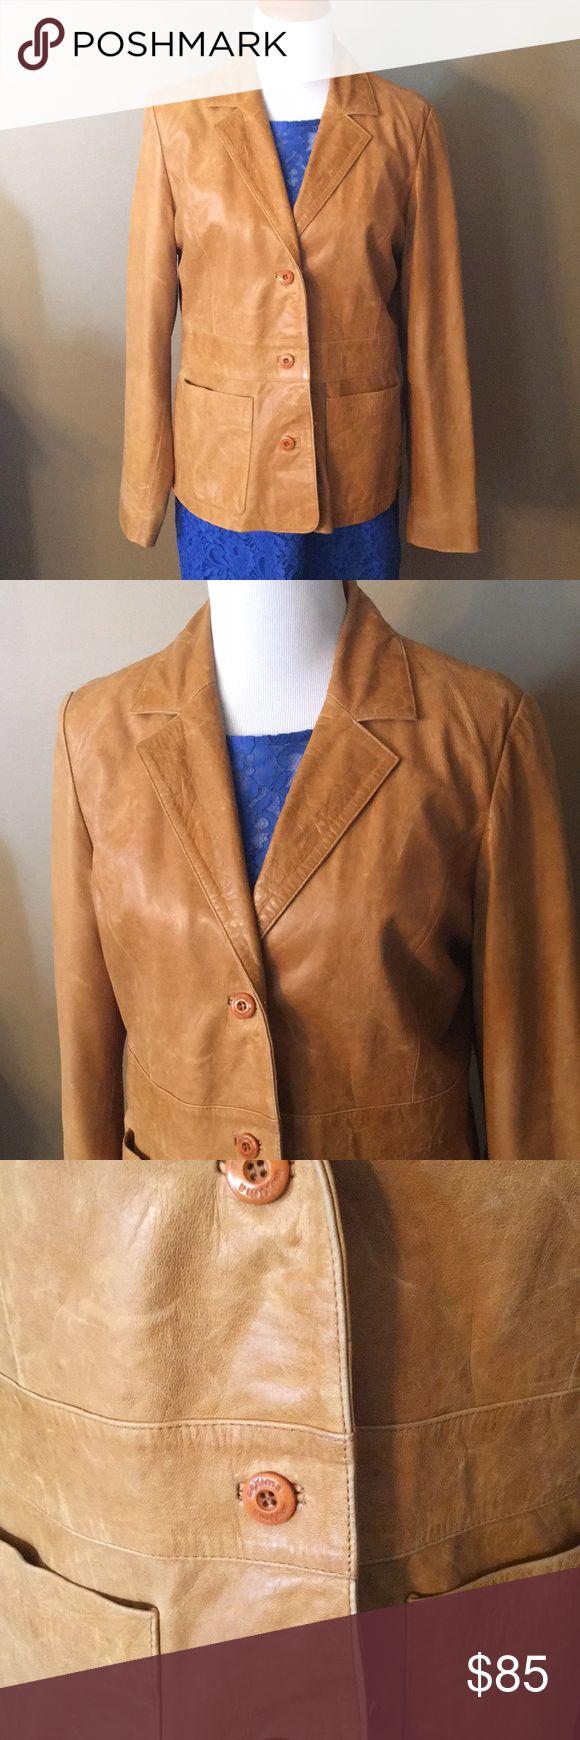 Wilson Maxima Leather Jacket Tan leather jackets